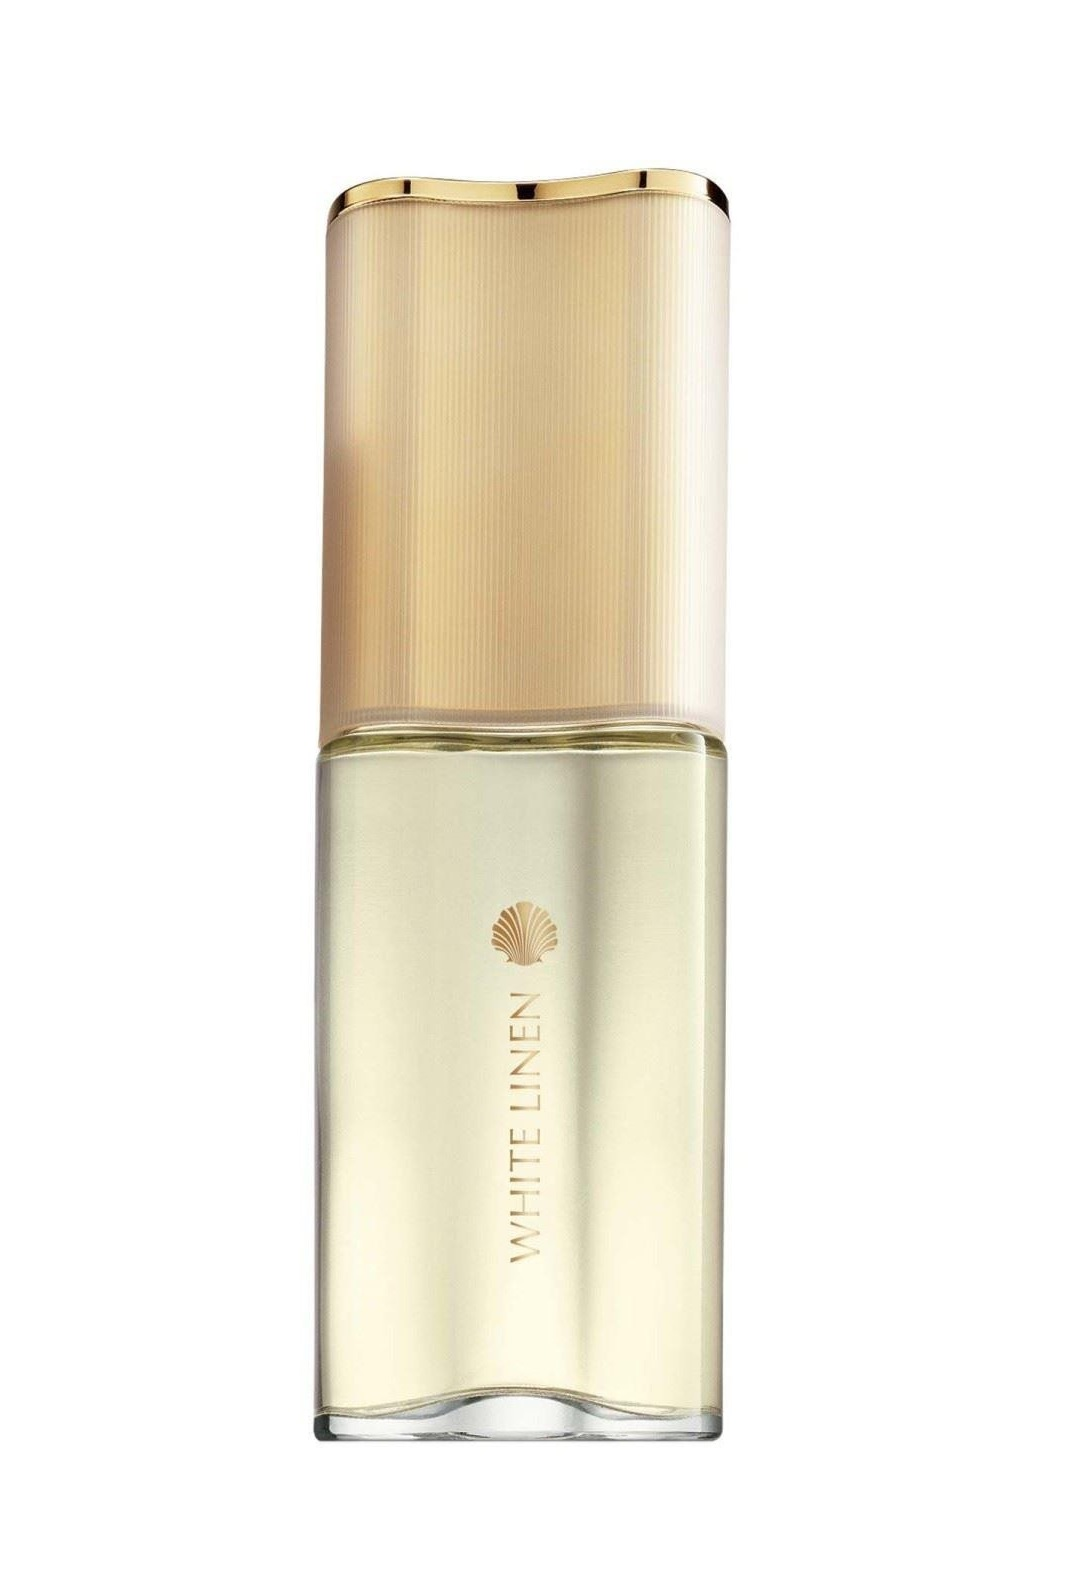 Estee Lauder Estee Lauder White Linen Women's Perfume